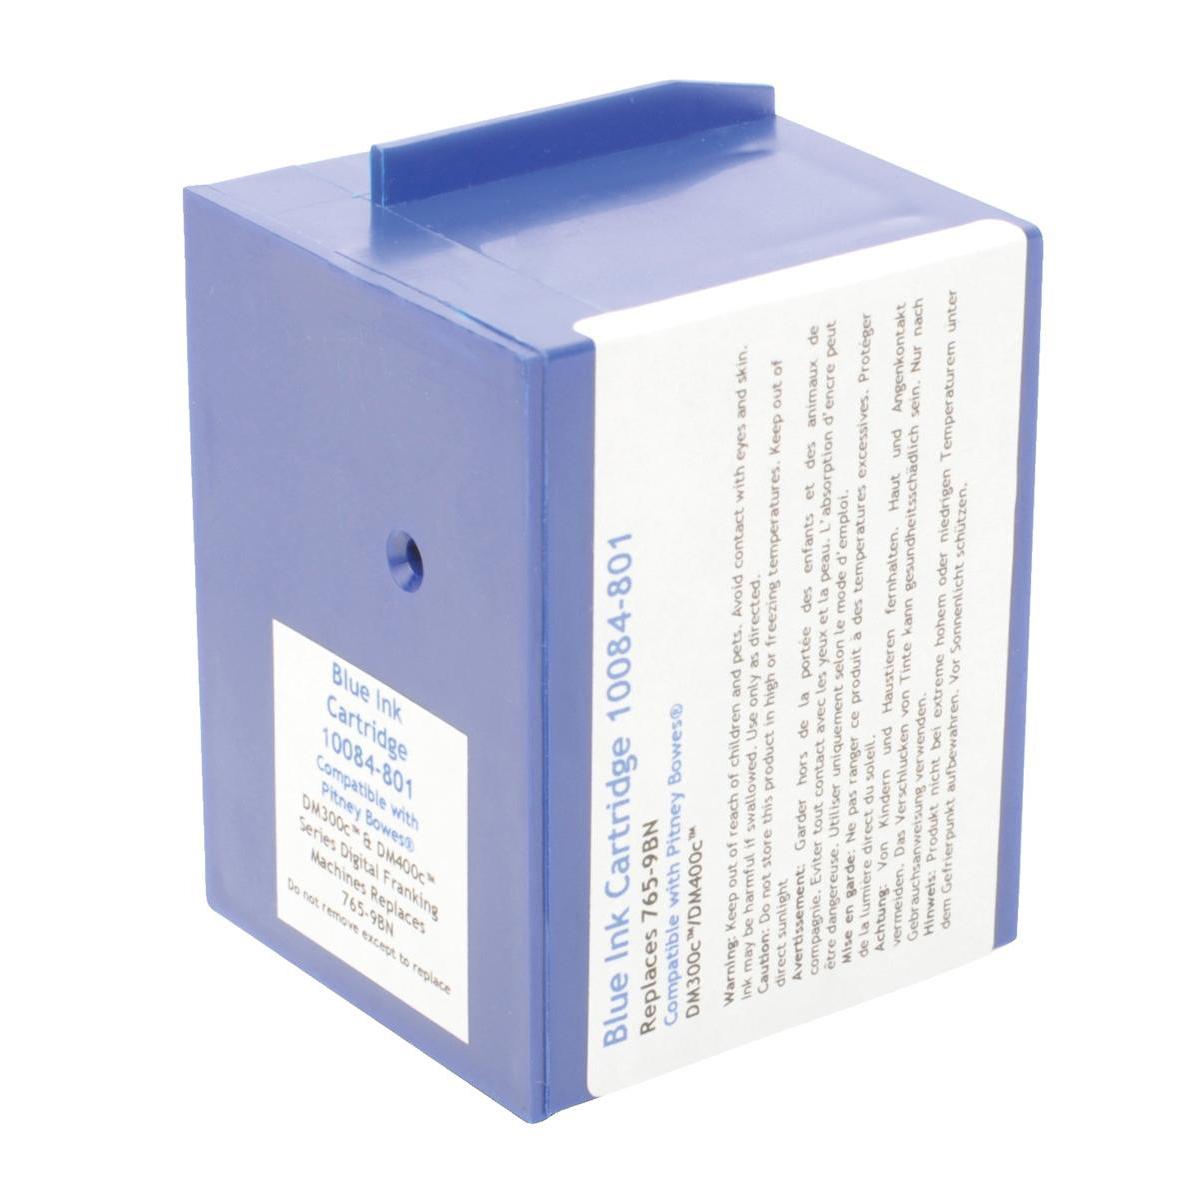 Image for Totalpost Franking Inkjet Cartridge Blue [Pitney Bowes DM300c/400c Equivalent] Ref 10084-801